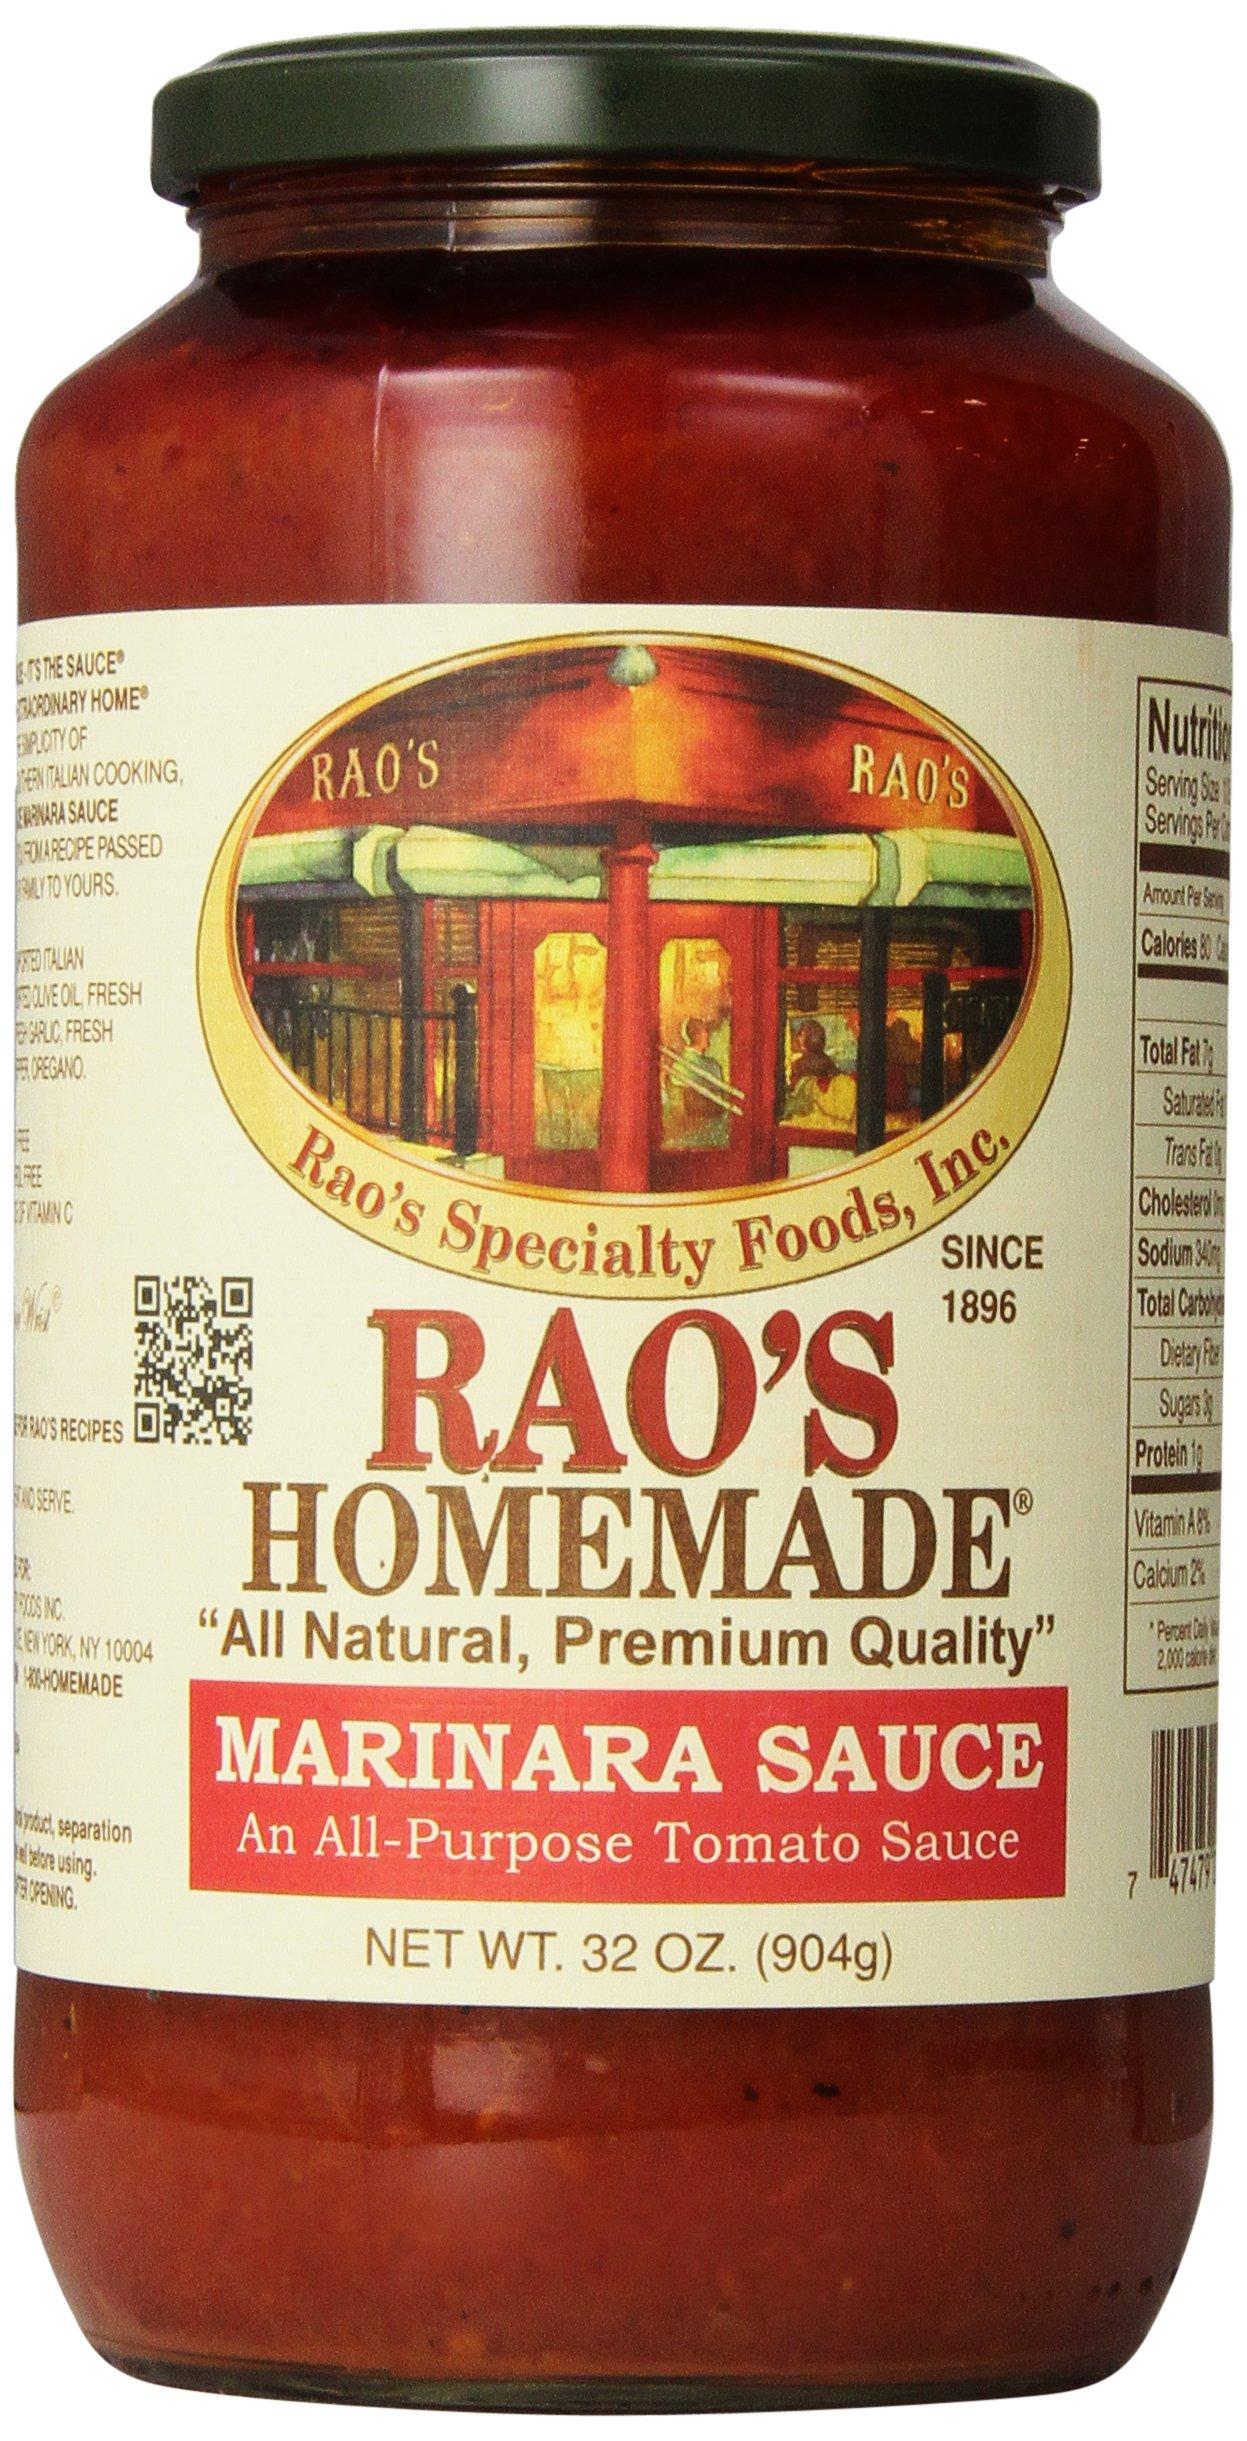 Rao's Specialty Foods, Marinara Sauce, 32 oz, Classic Italian Tomato Sauce, Great on Pasta, Made With Fresh Basil, Italian Tomatoes, Garlic, and Seasonings, No Sugar Added